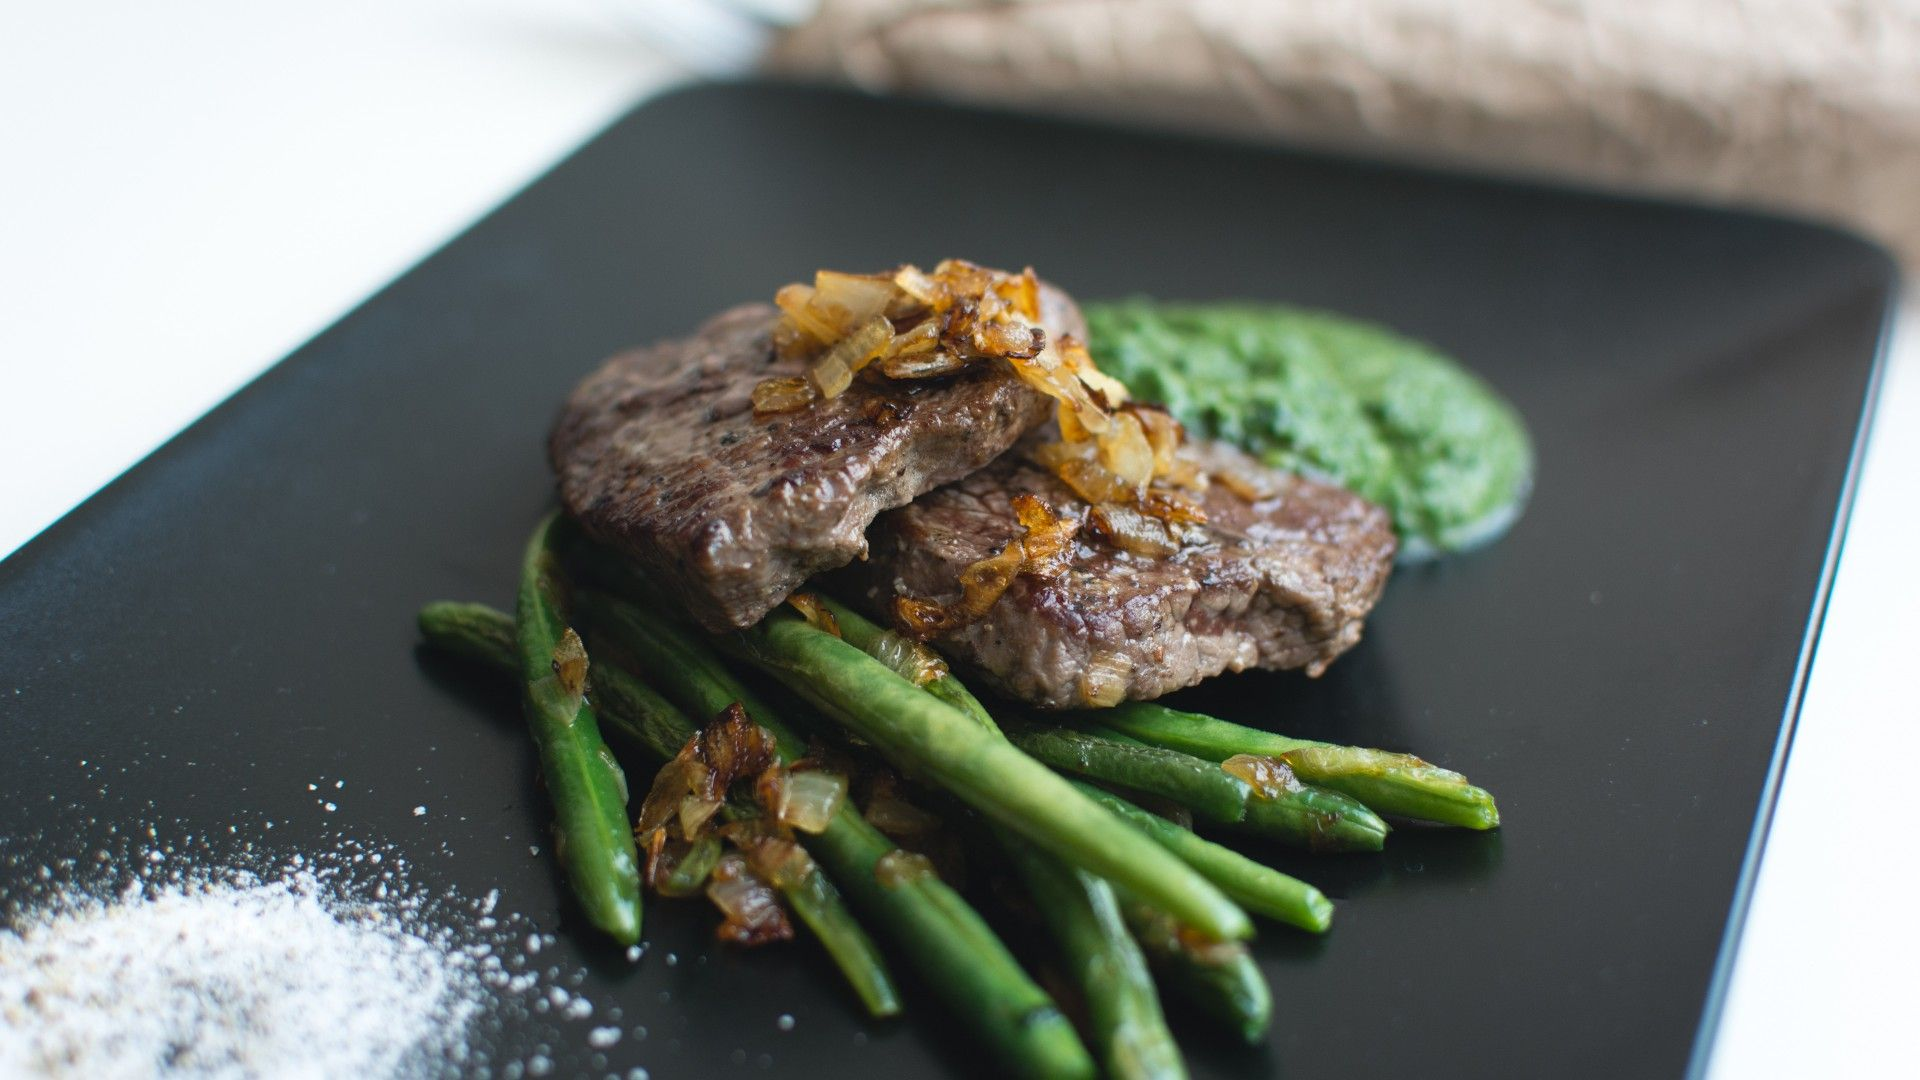 Steak asparagus #sauce http://bit.ly/1SOIk79 #recipes #health #food #Food_Niche